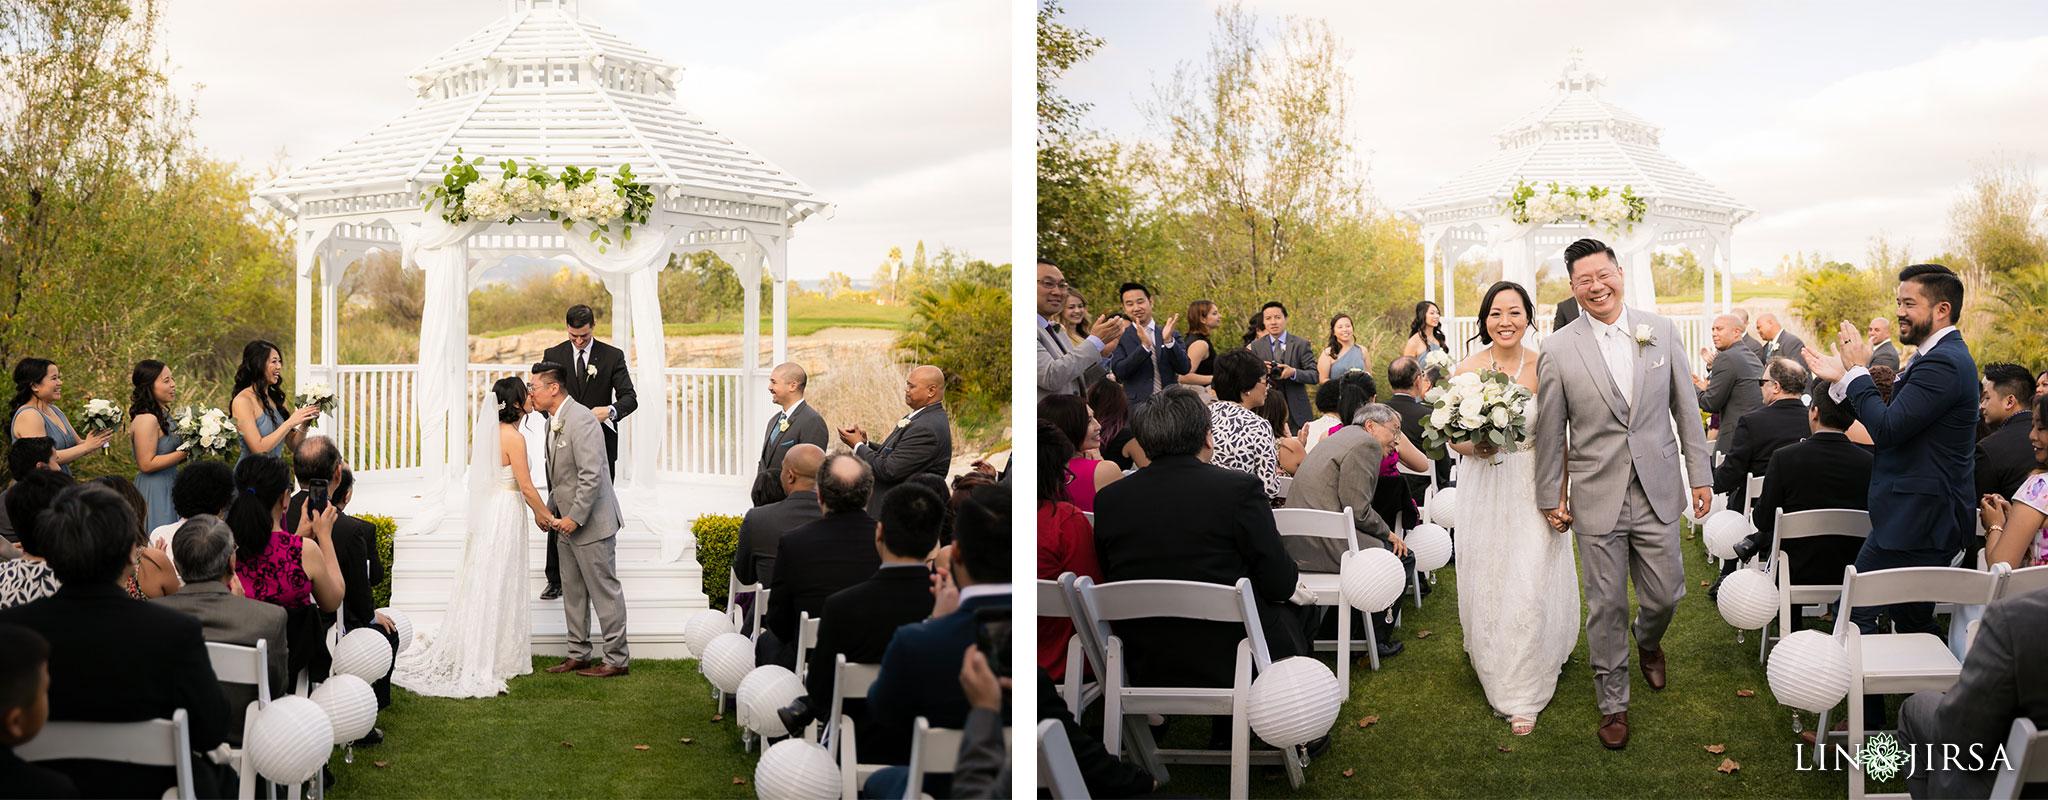 19 westridge golf club la habra wedding ceremony photography